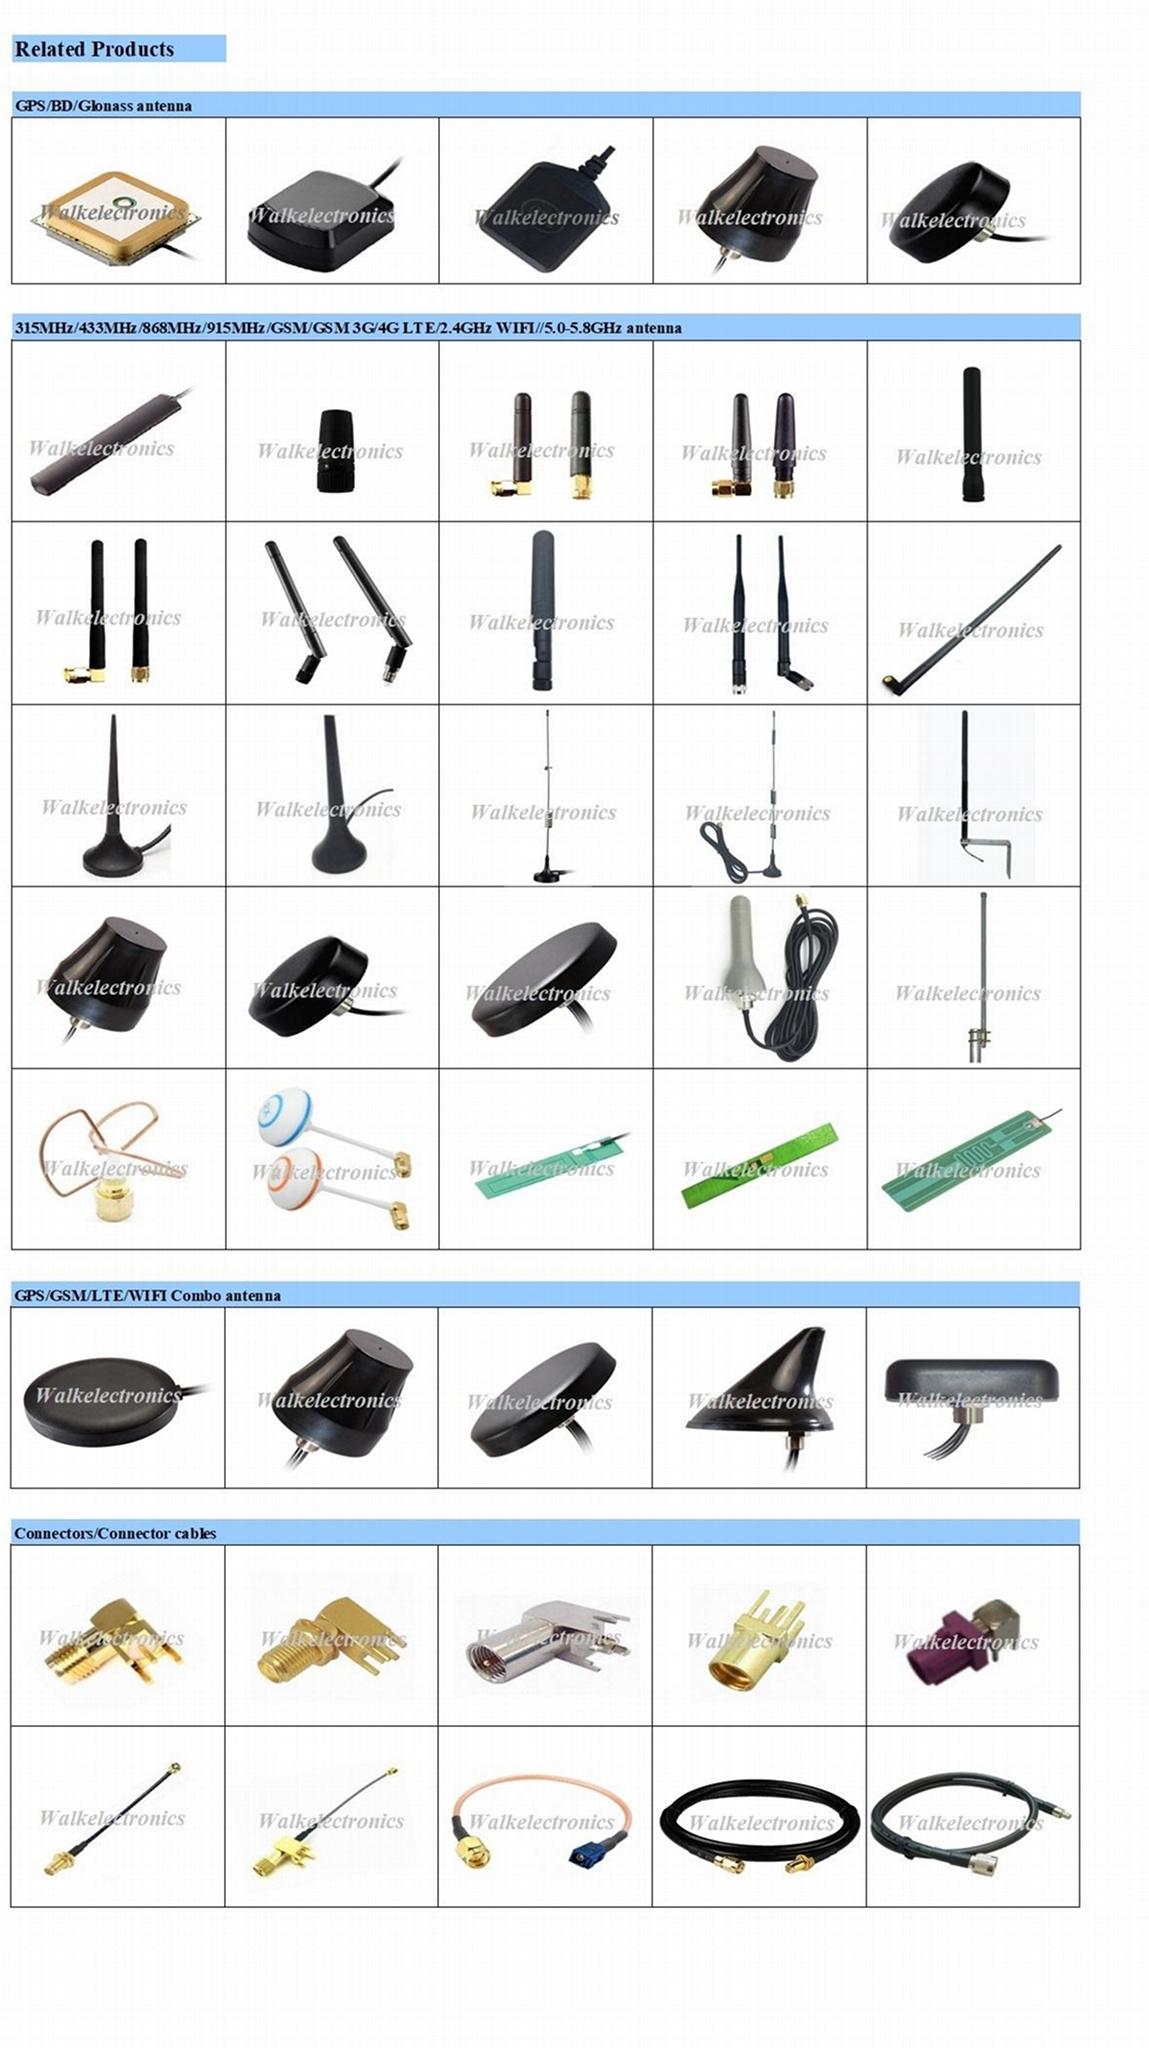 160mm 5dbi high gain omni directional SMA flexible gsm 3g 4g lte rubber antenna 3